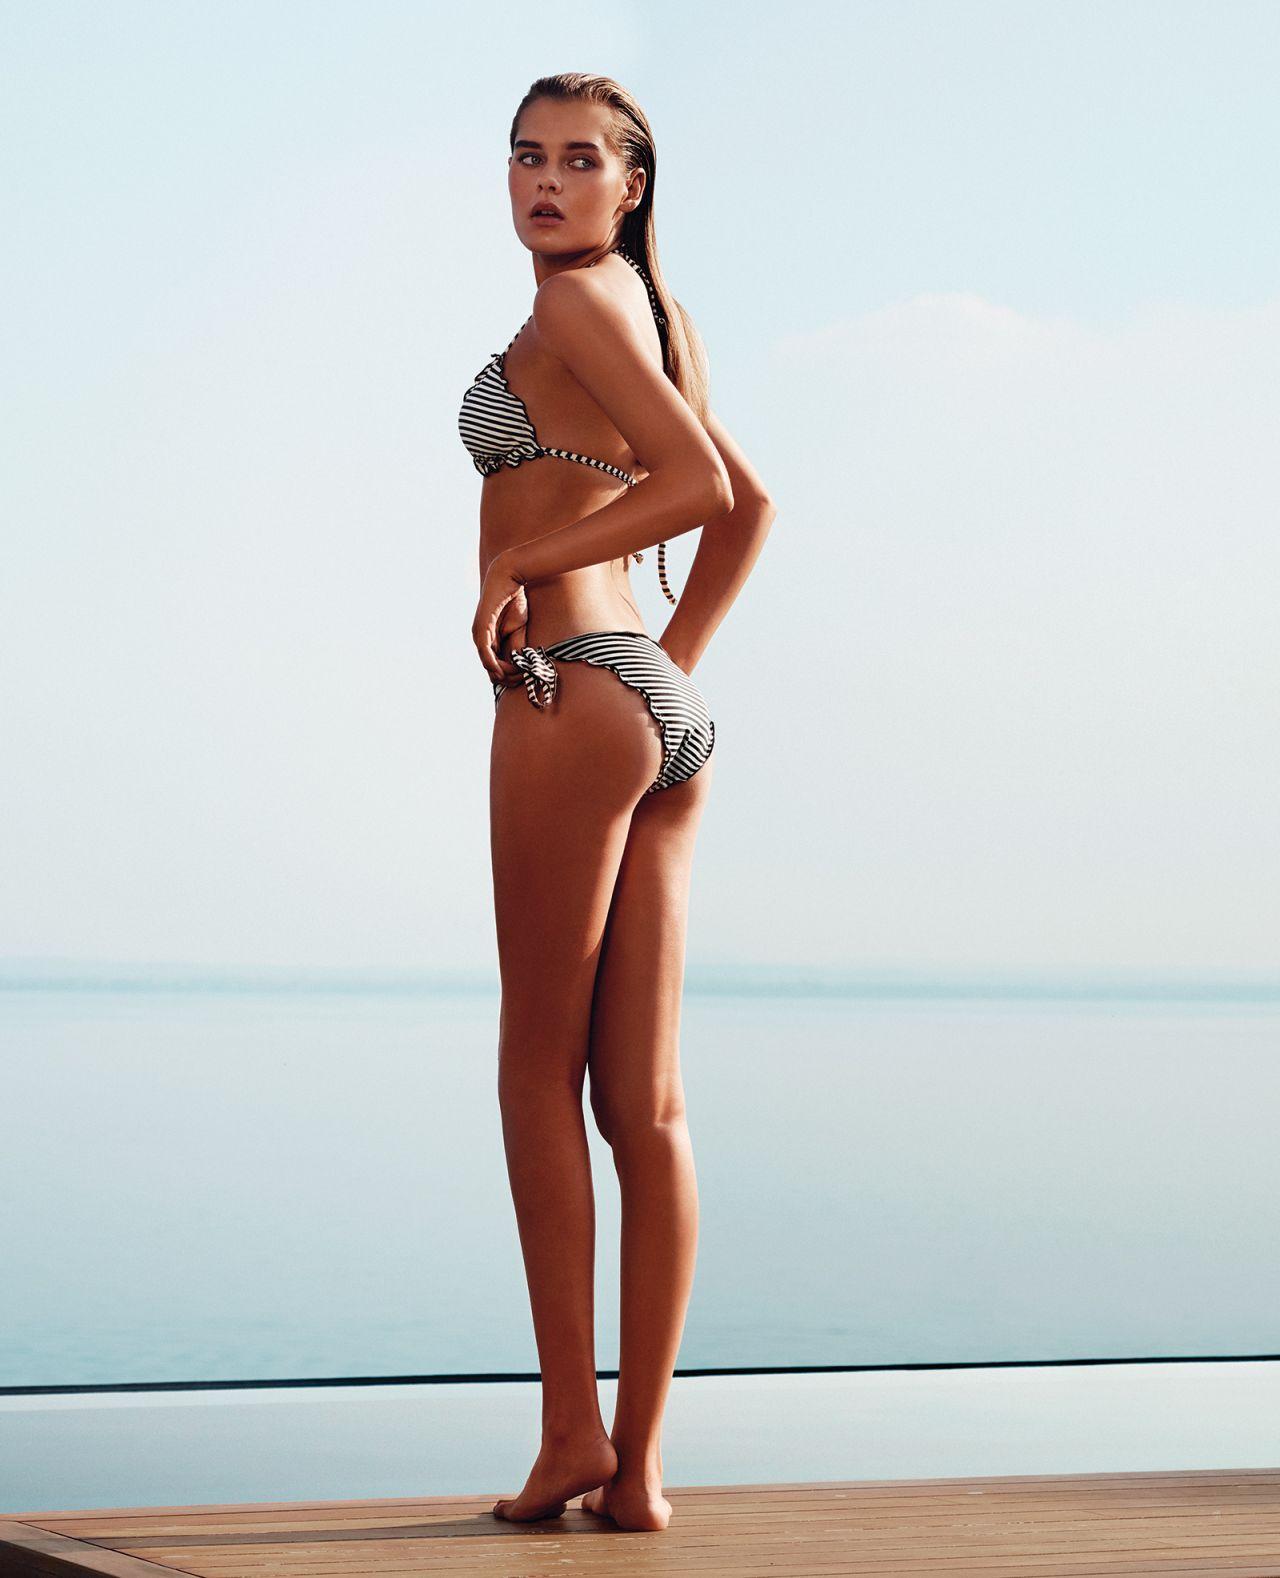 Video Solveig Mork Hansen nude (79 photos), Topless, Bikini, Selfie, lingerie 2020